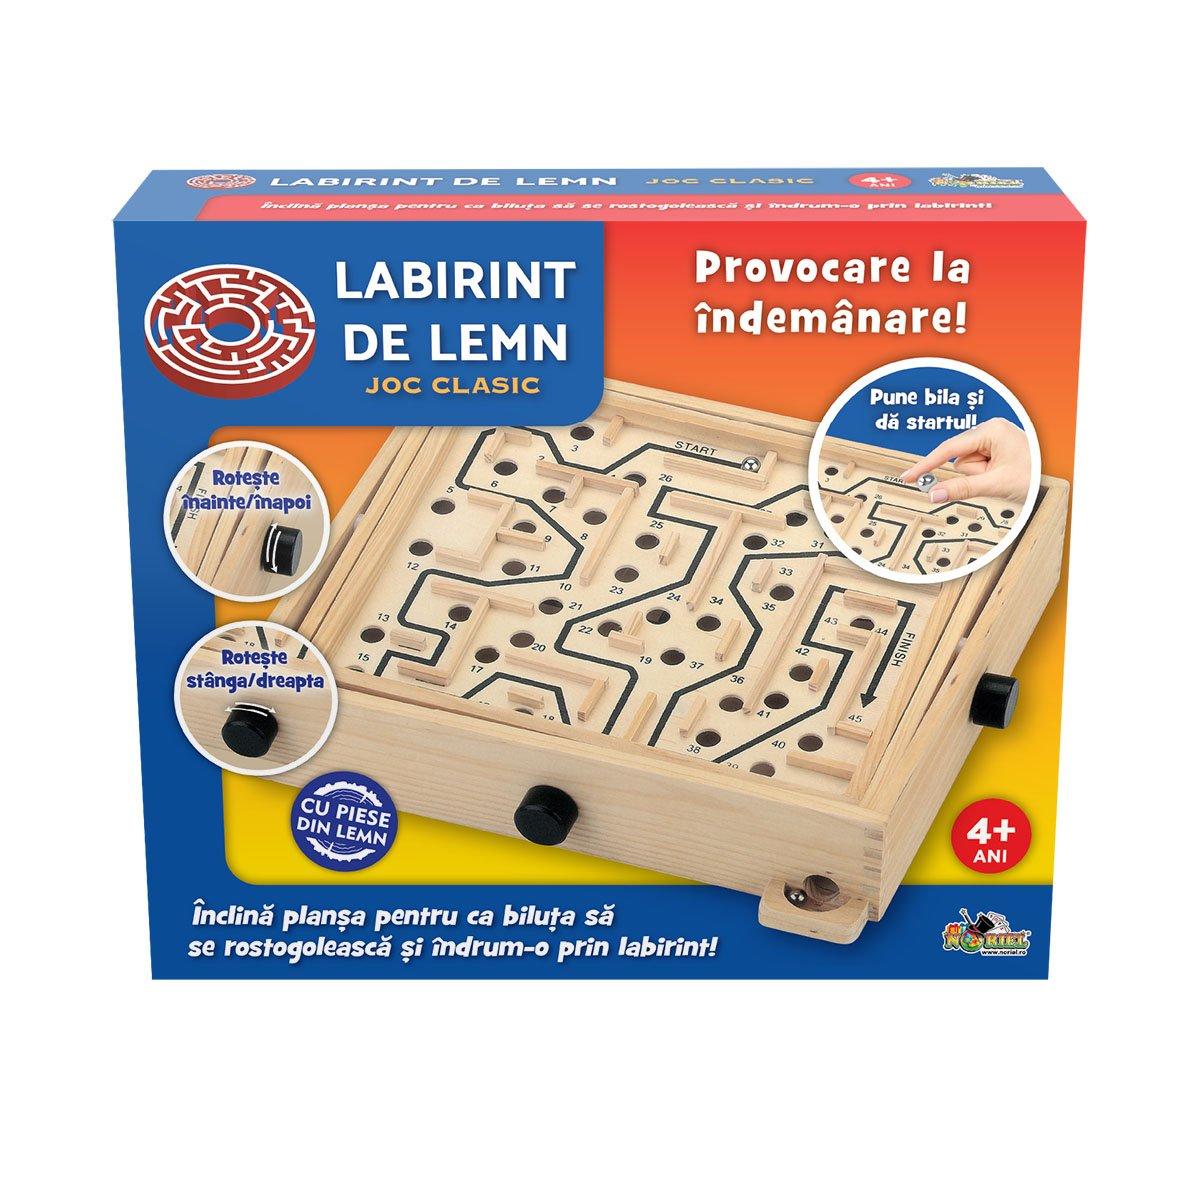 Joc clasic Noriel Games, Labirint de lemn